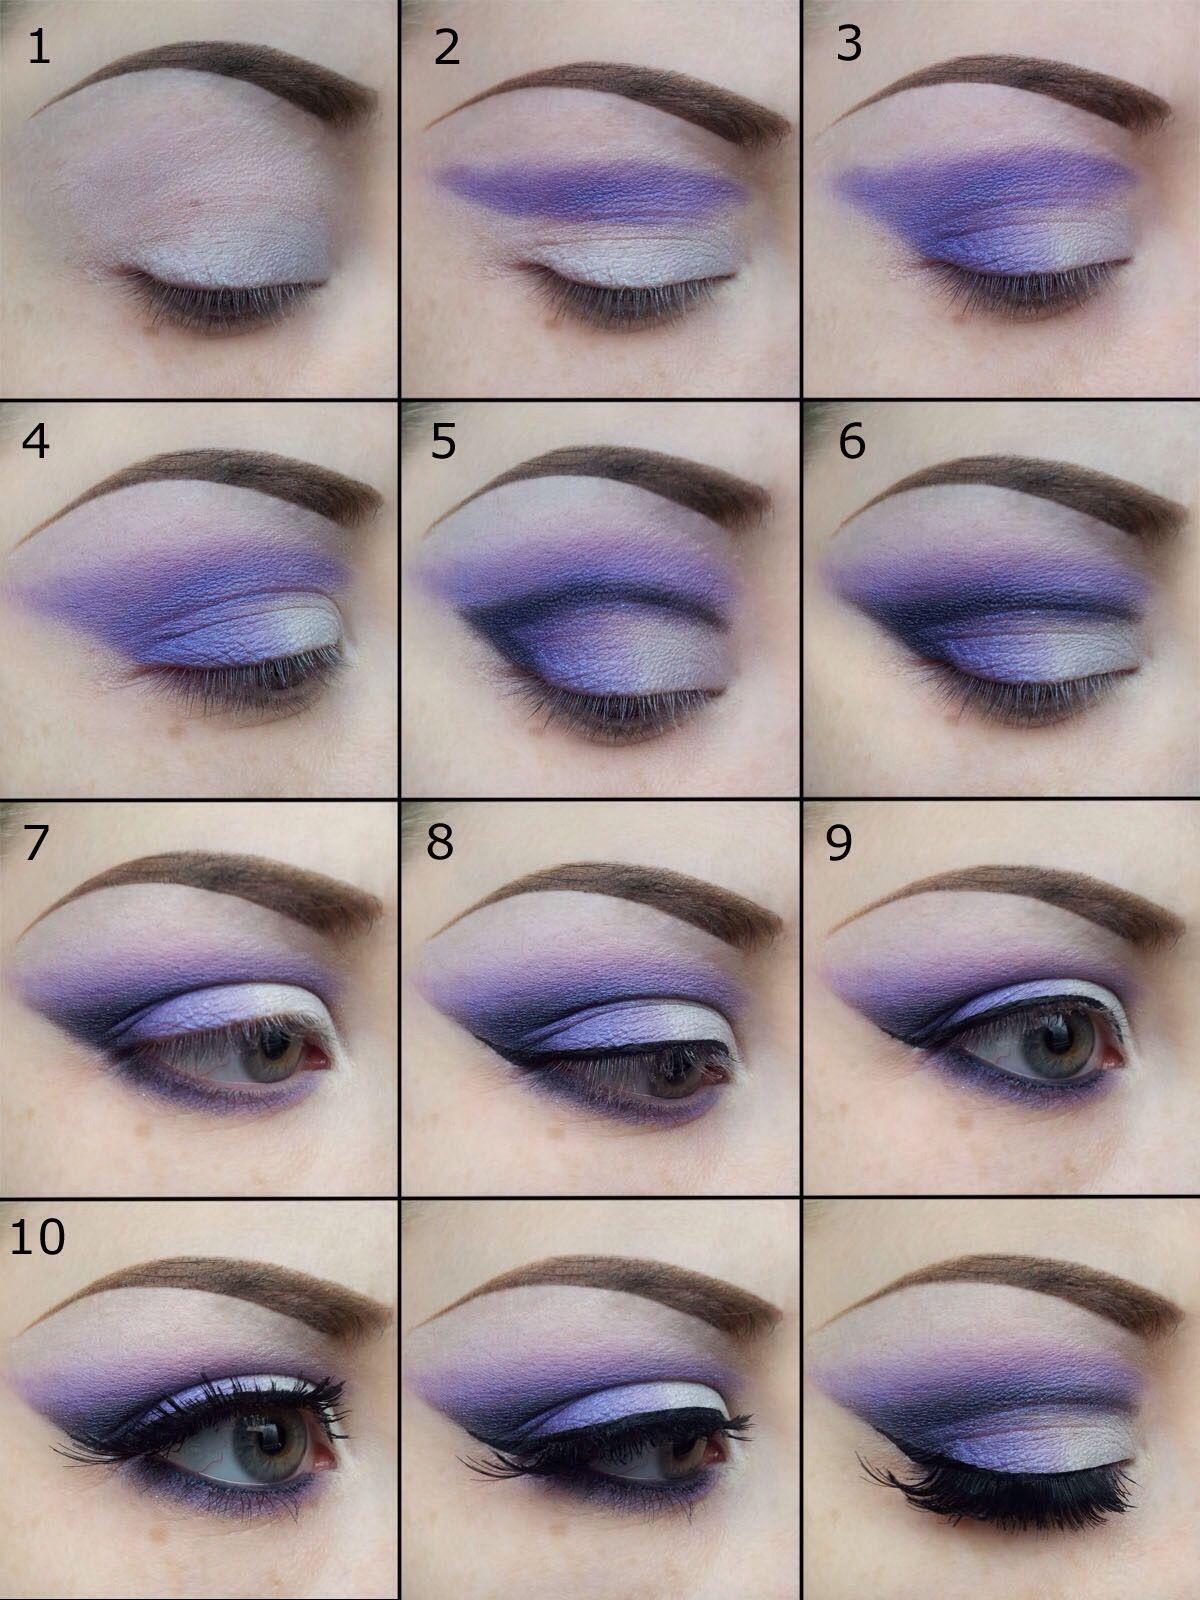 Eyeshadow: Purple Eyeshadow Tutorial, Lovely!